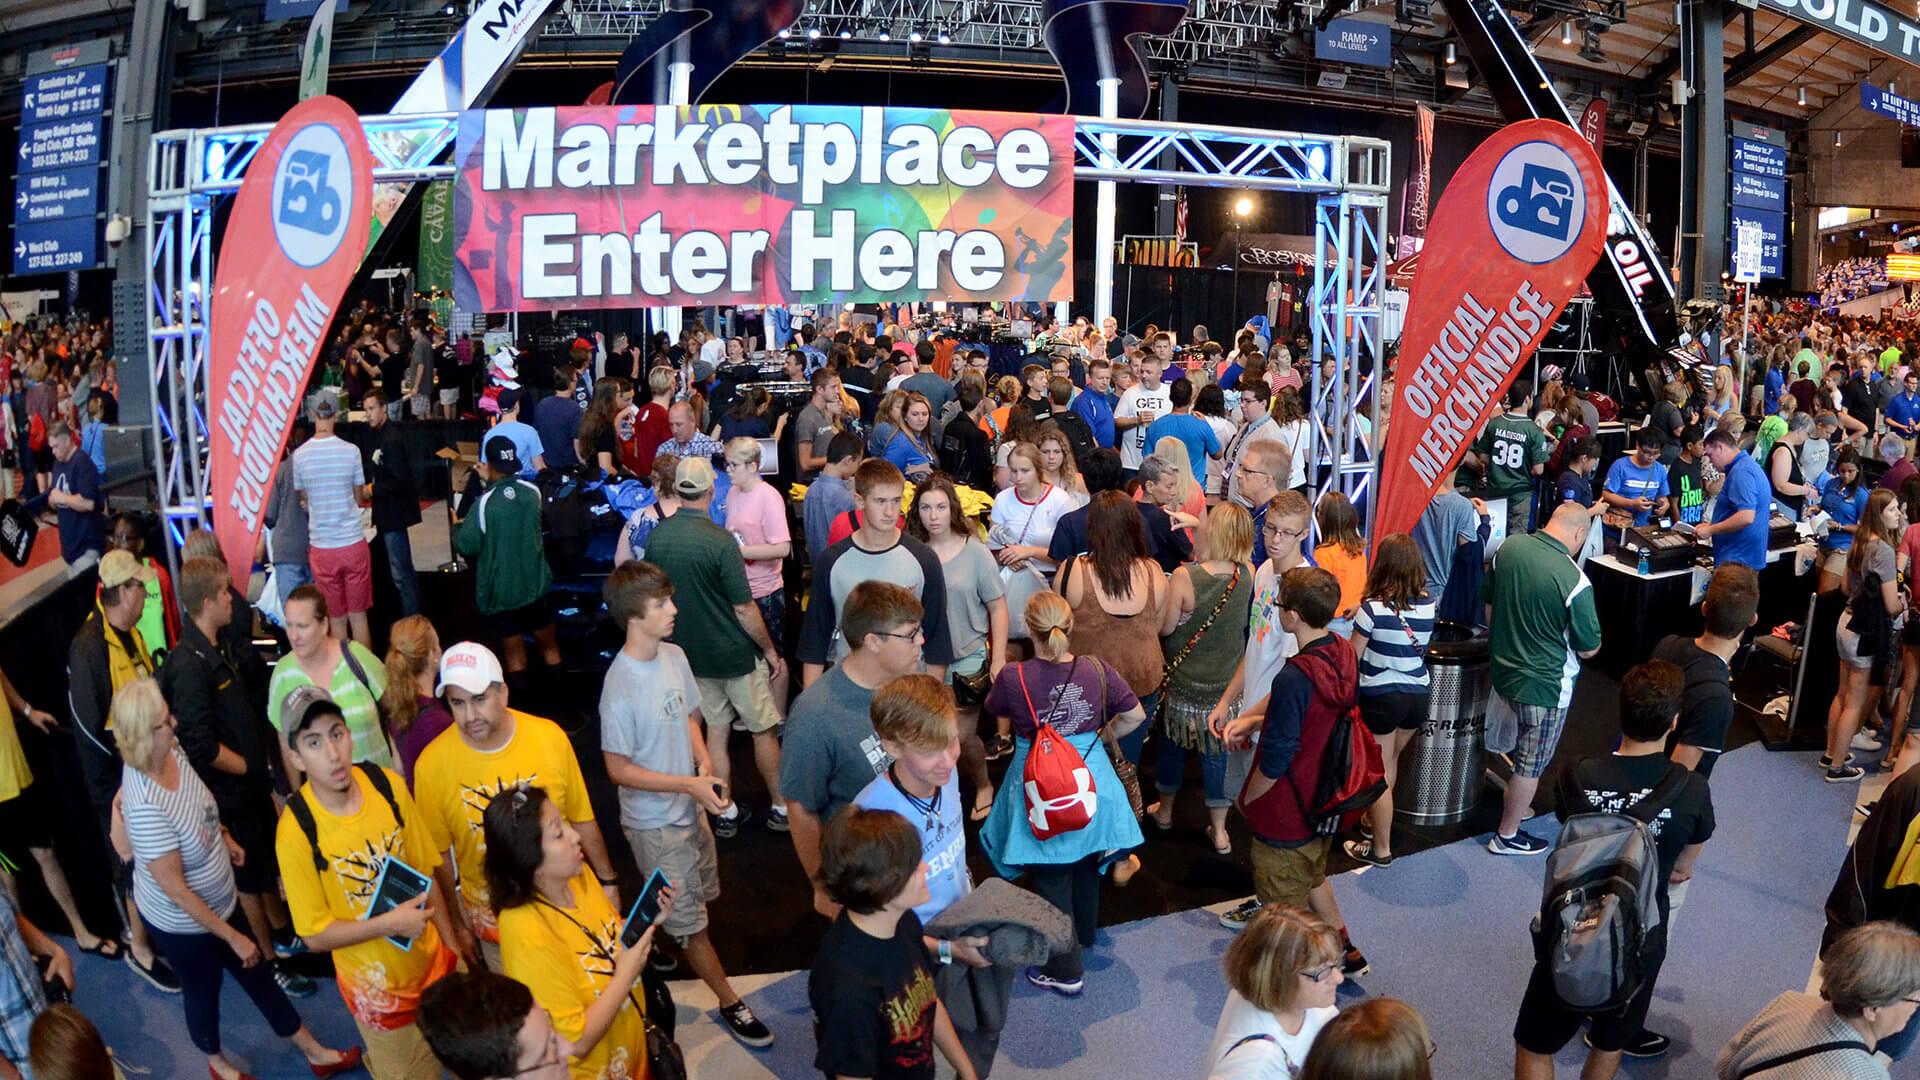 Drum Corps International, MainGate agree to retail partnership